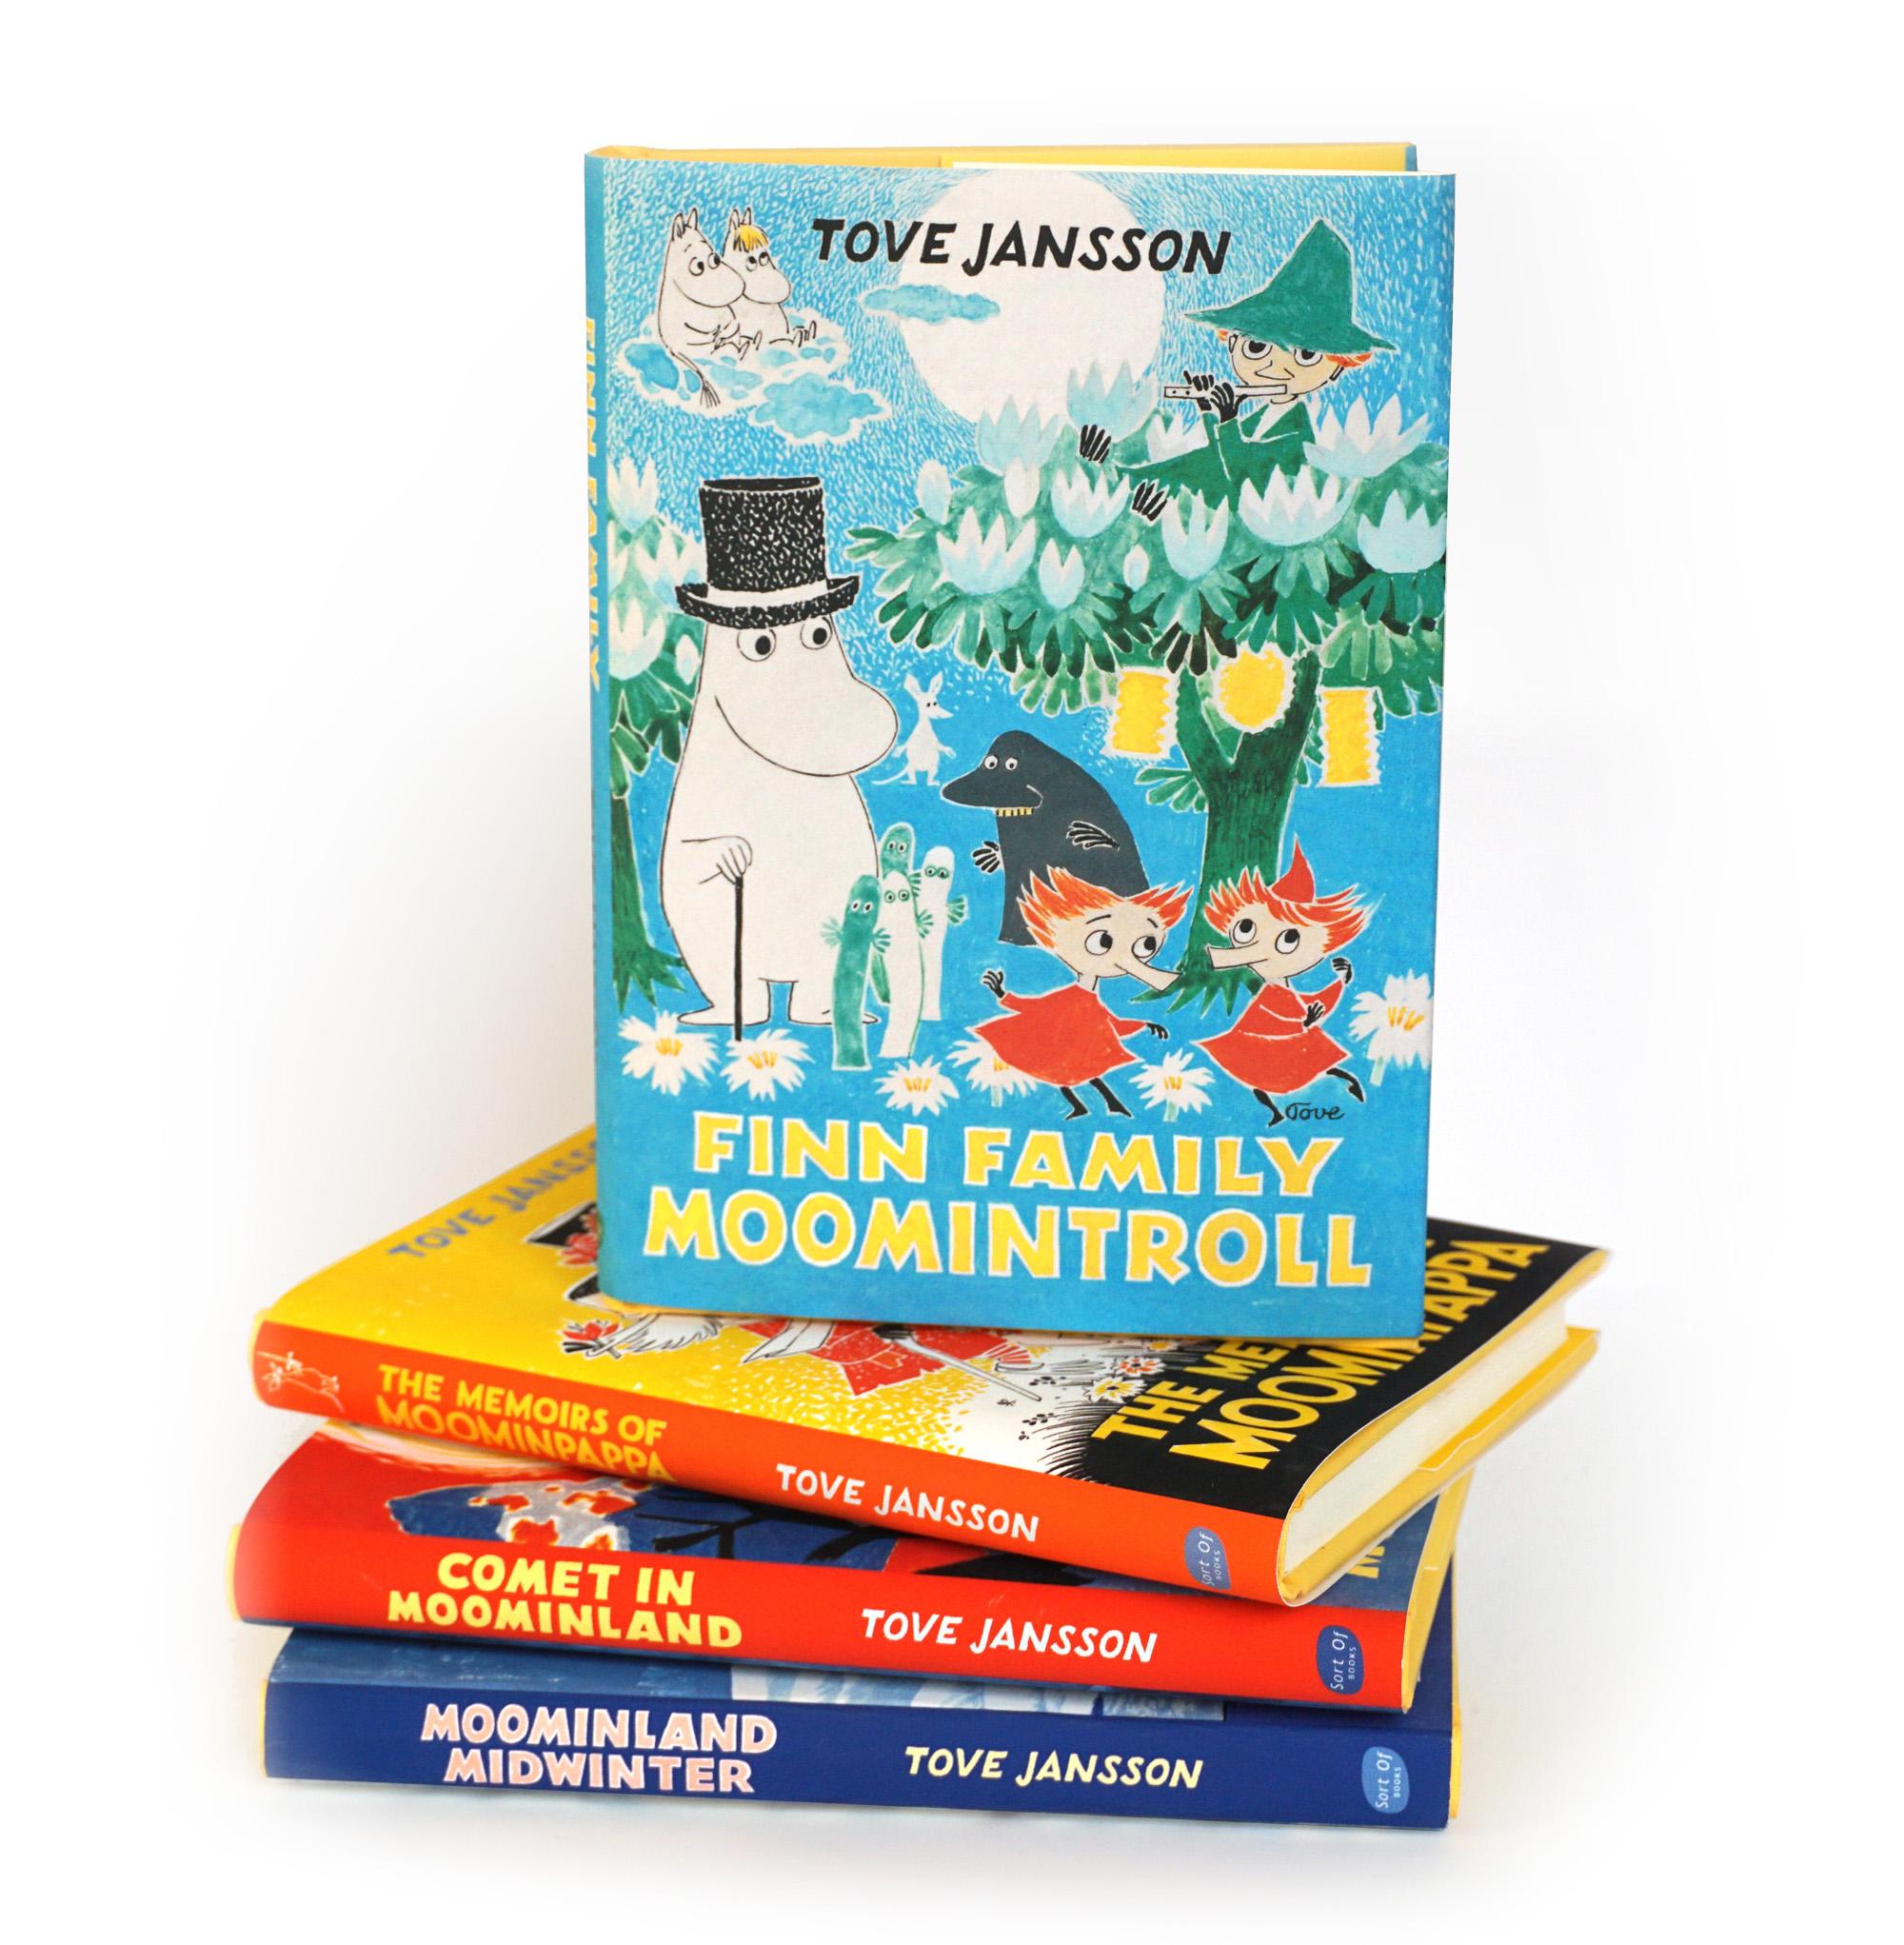 Finn Family Moomintroll collection